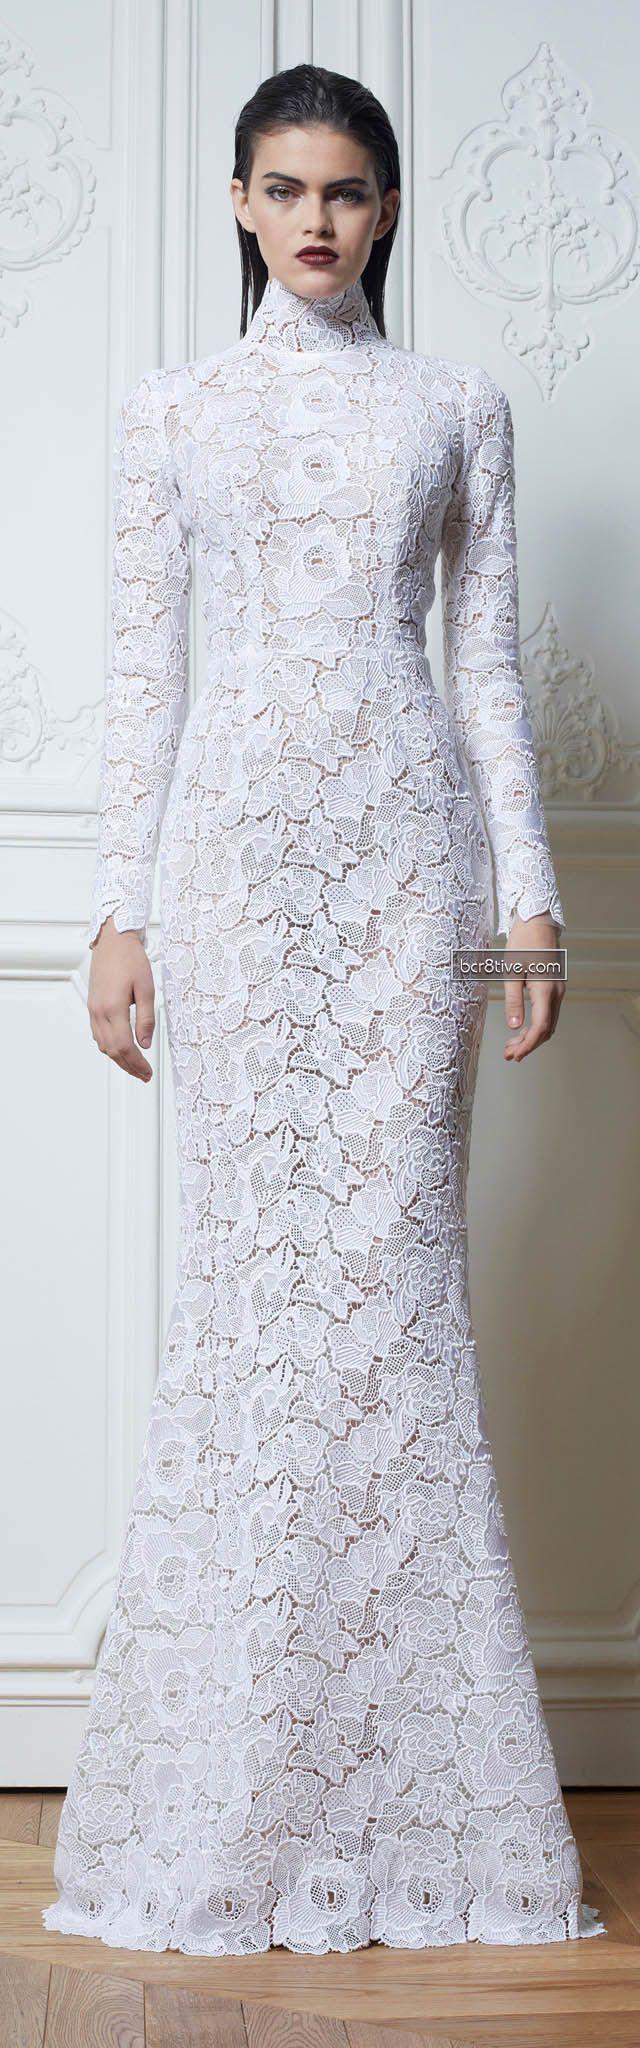 best krikor images on pinterest night out dresses sweet dress